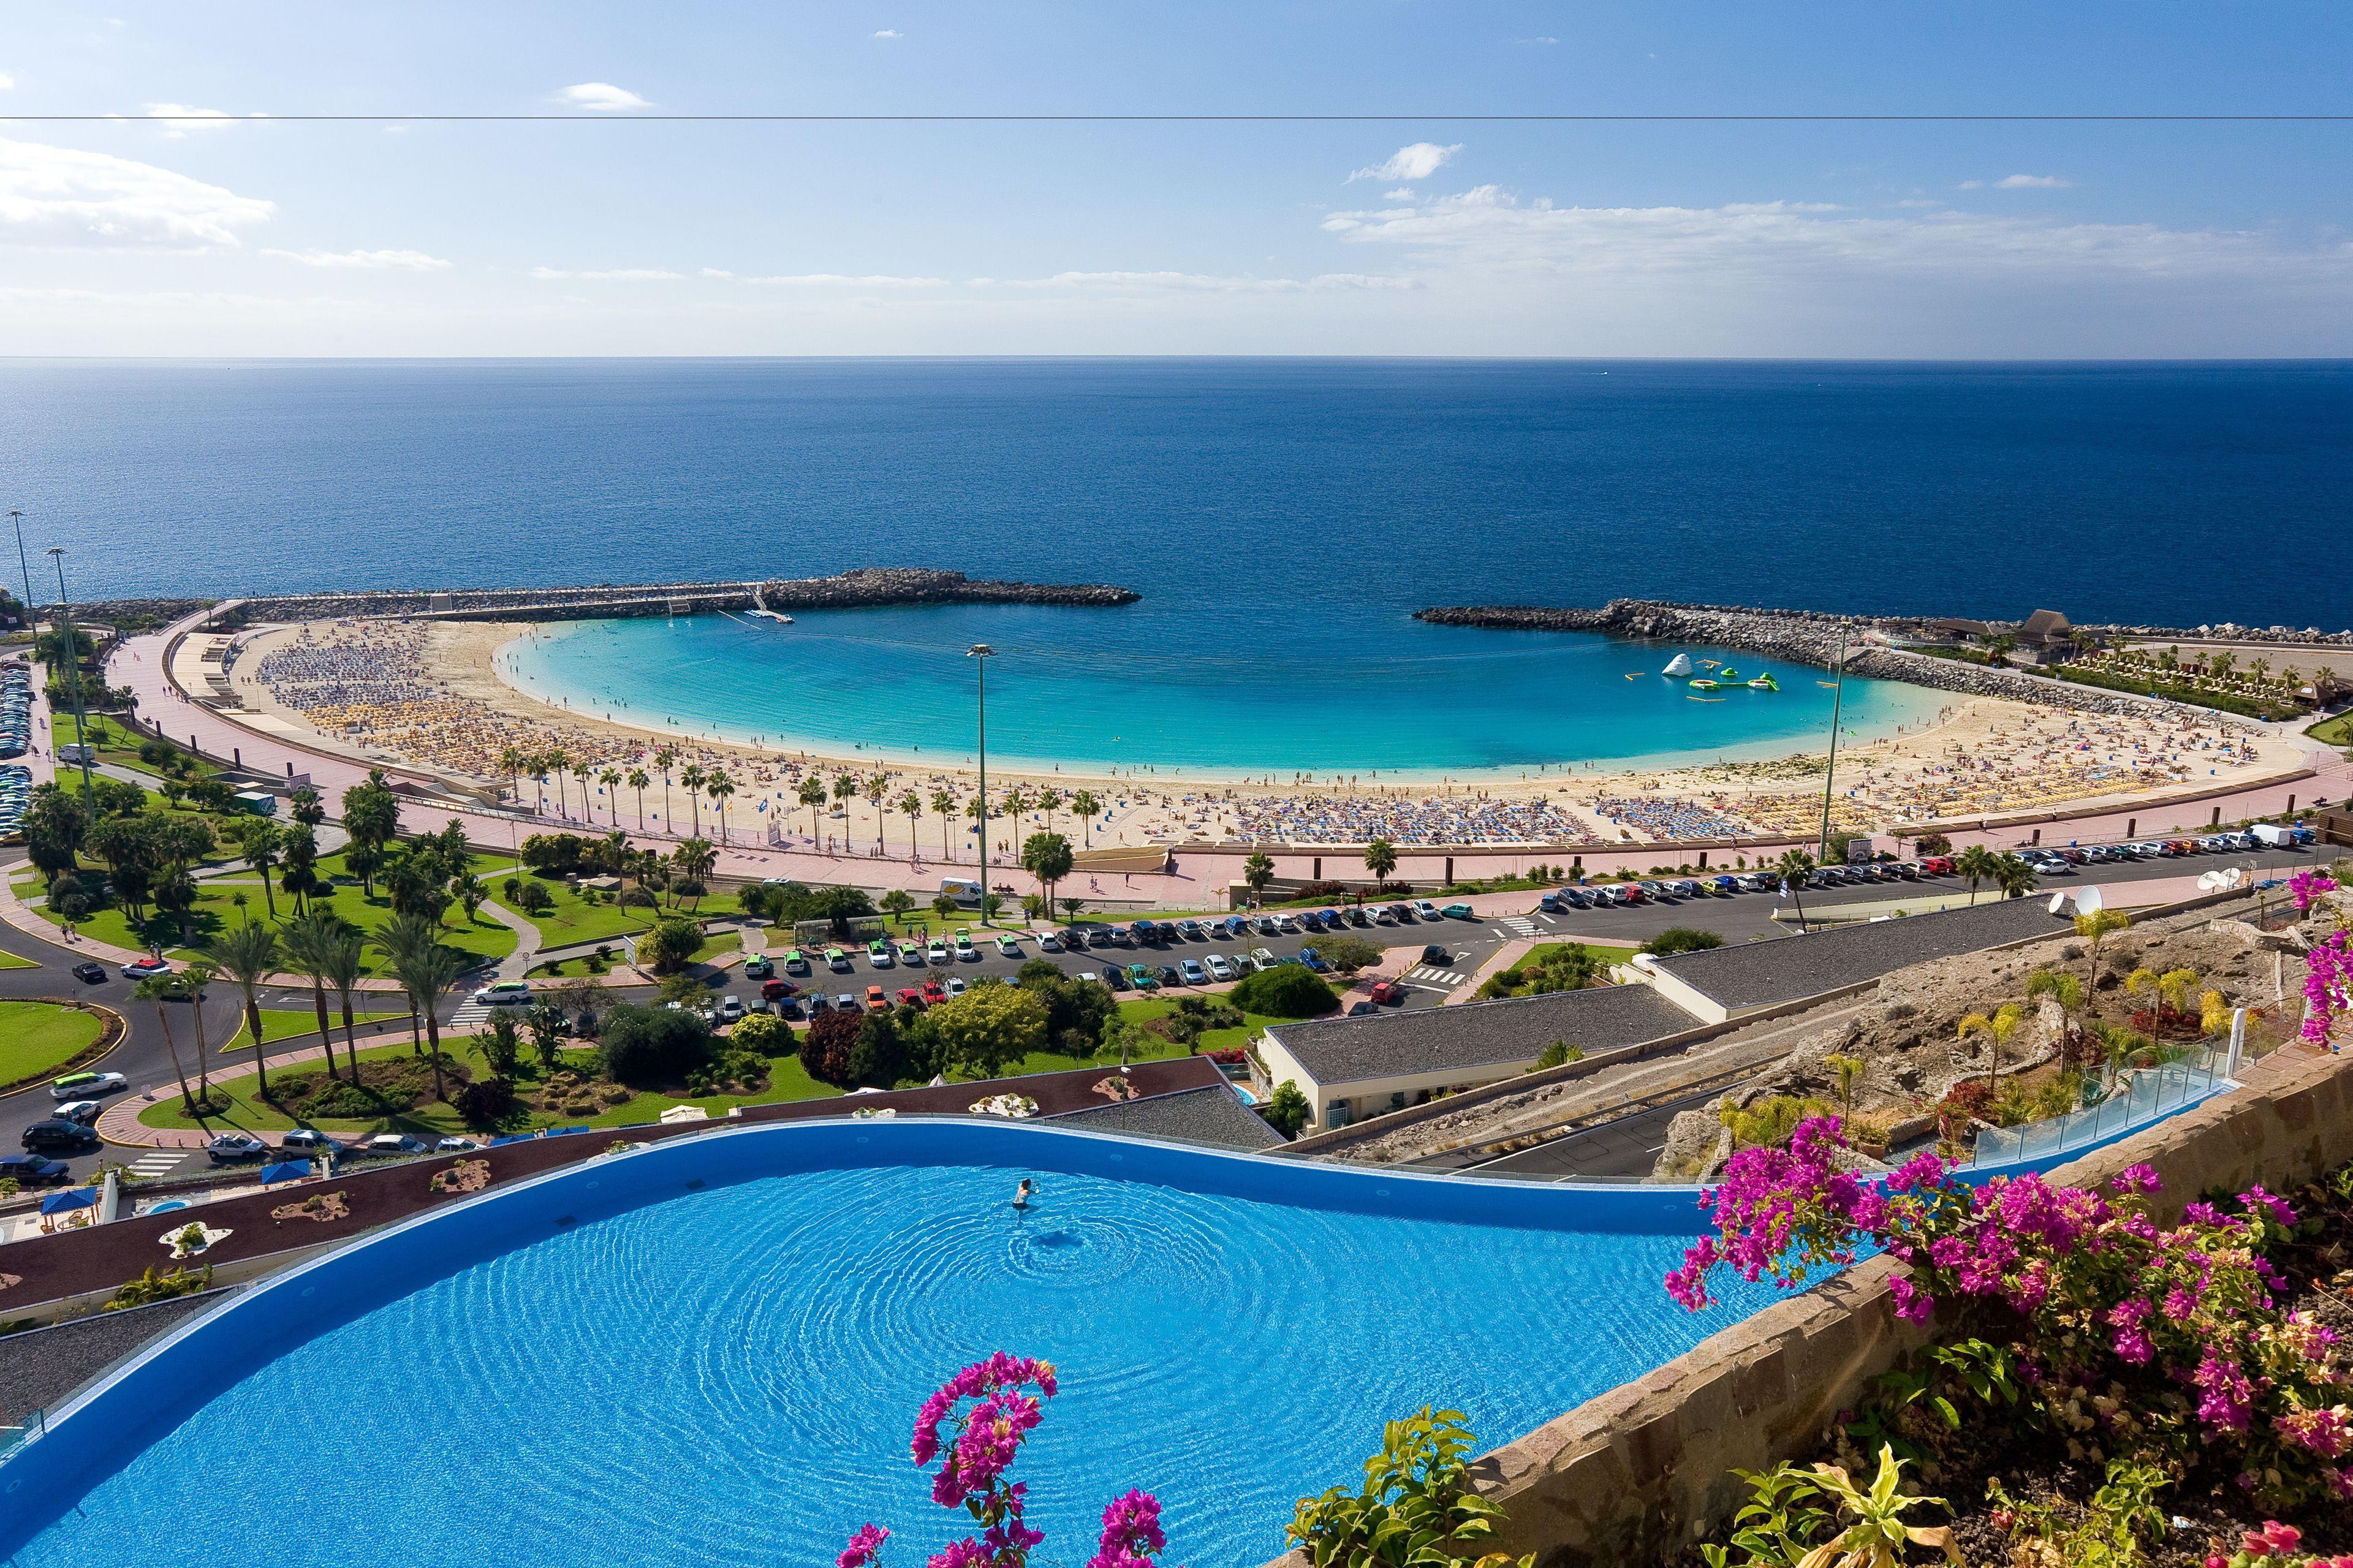 Courtesy of Gloria Palace Royal Hotel & Spa / Expedia